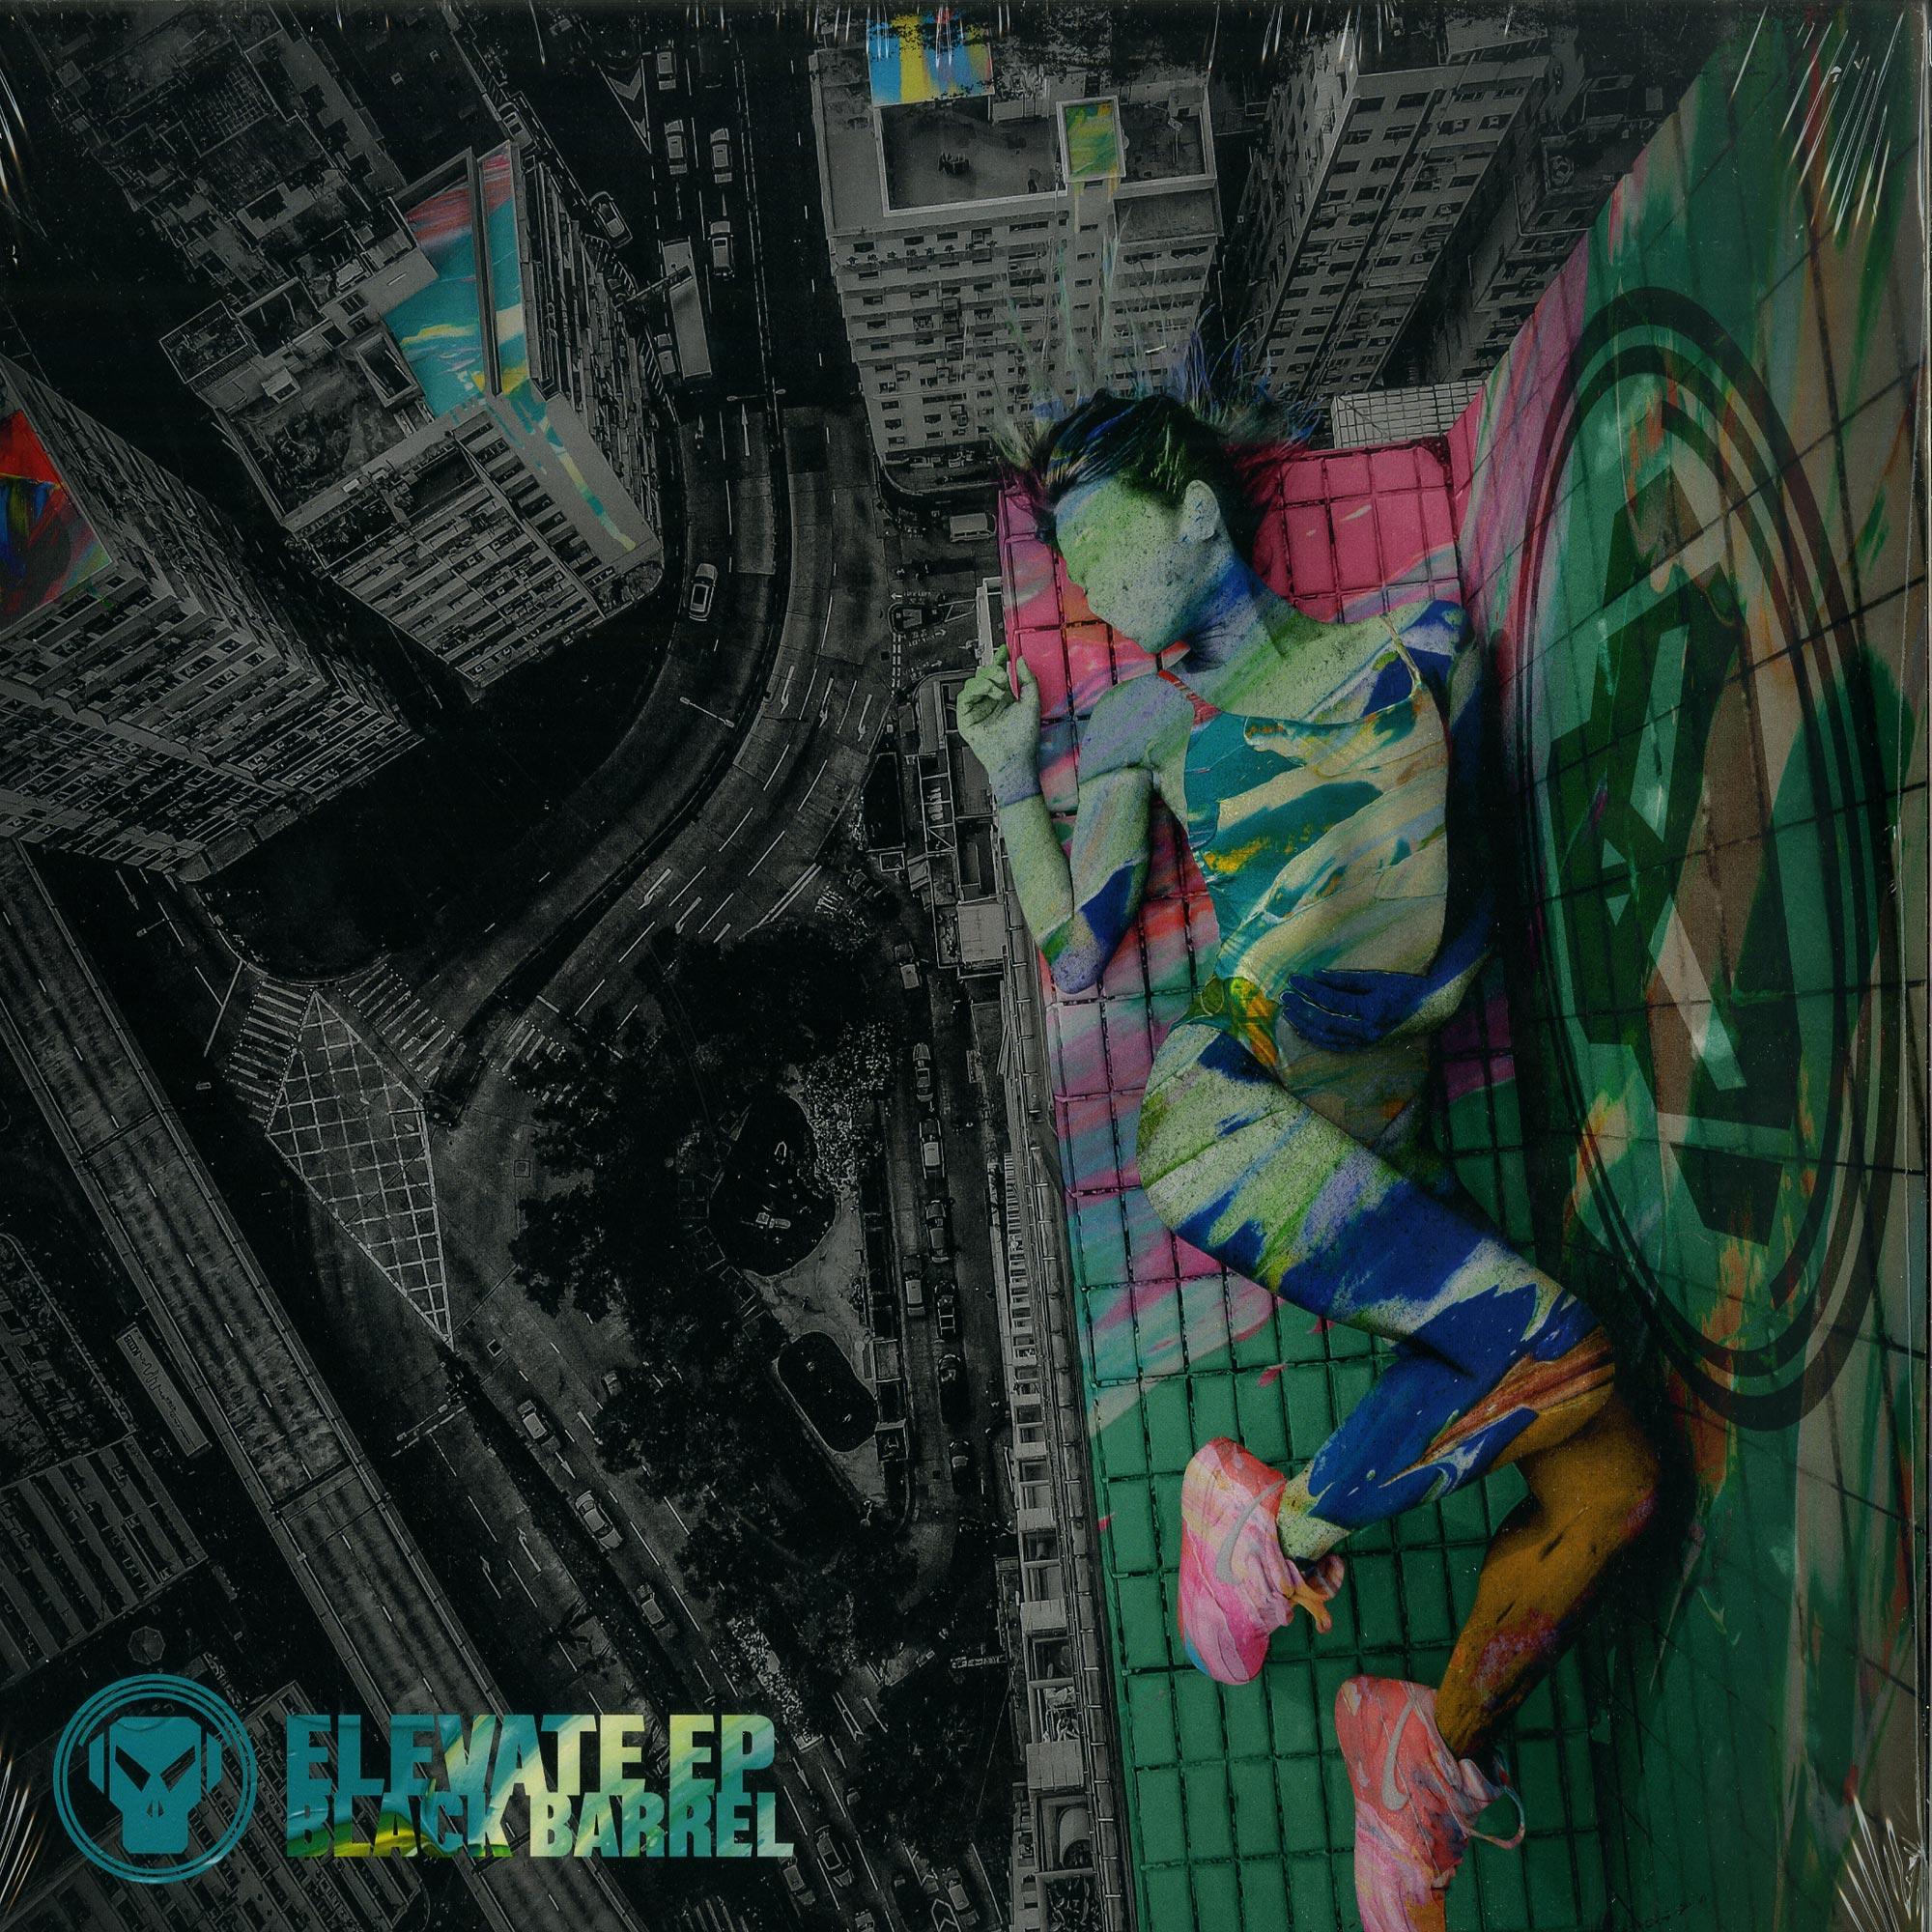 Black Barrel - ELEVATE EP